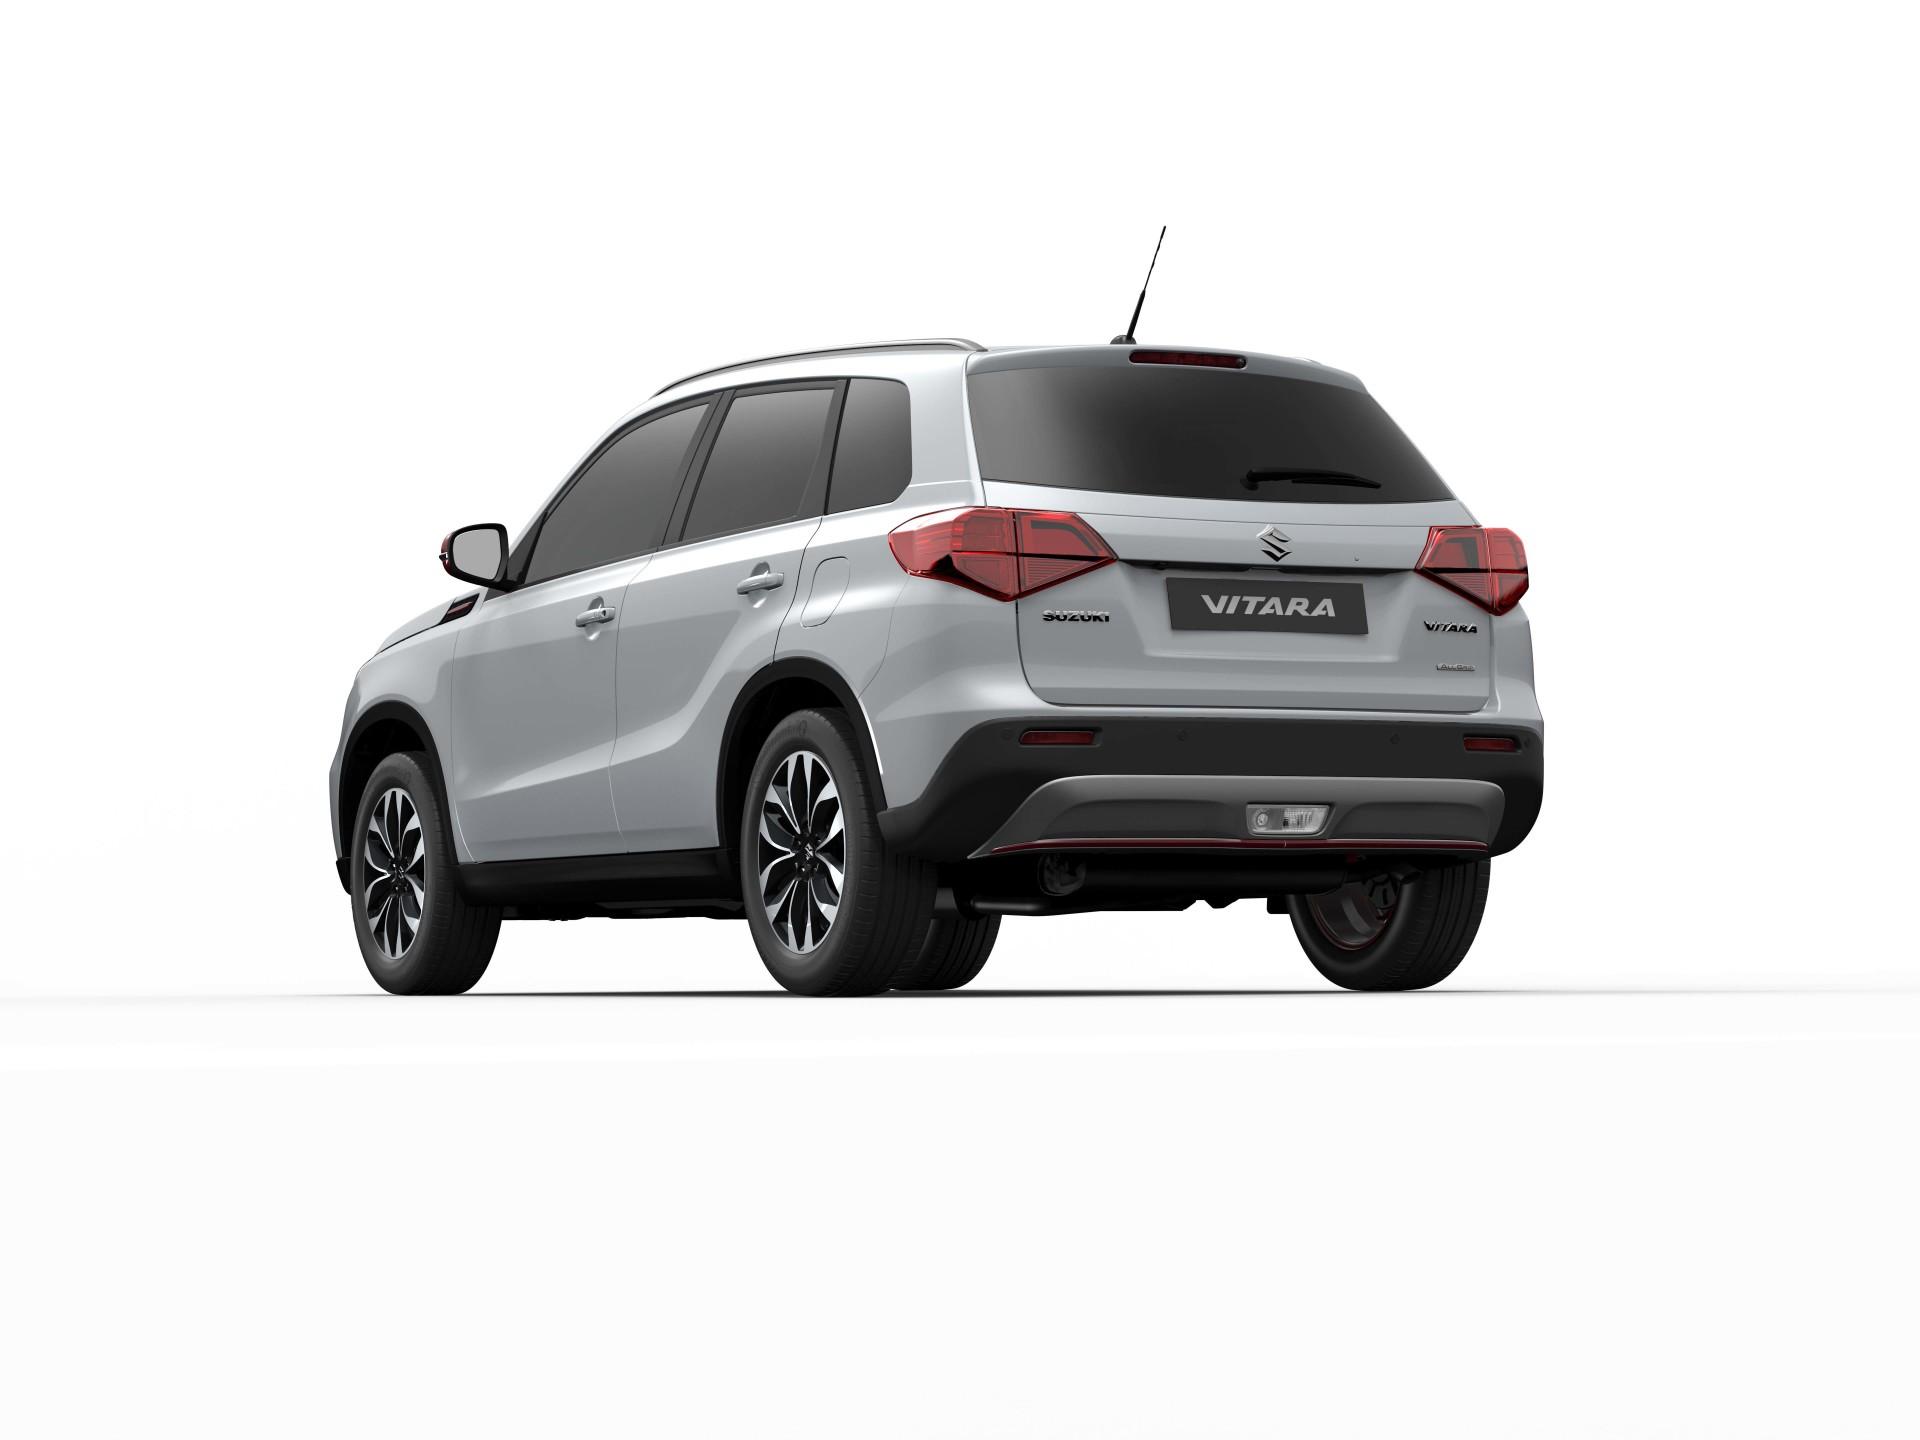 Suzuki Vitara 2018 Urban2